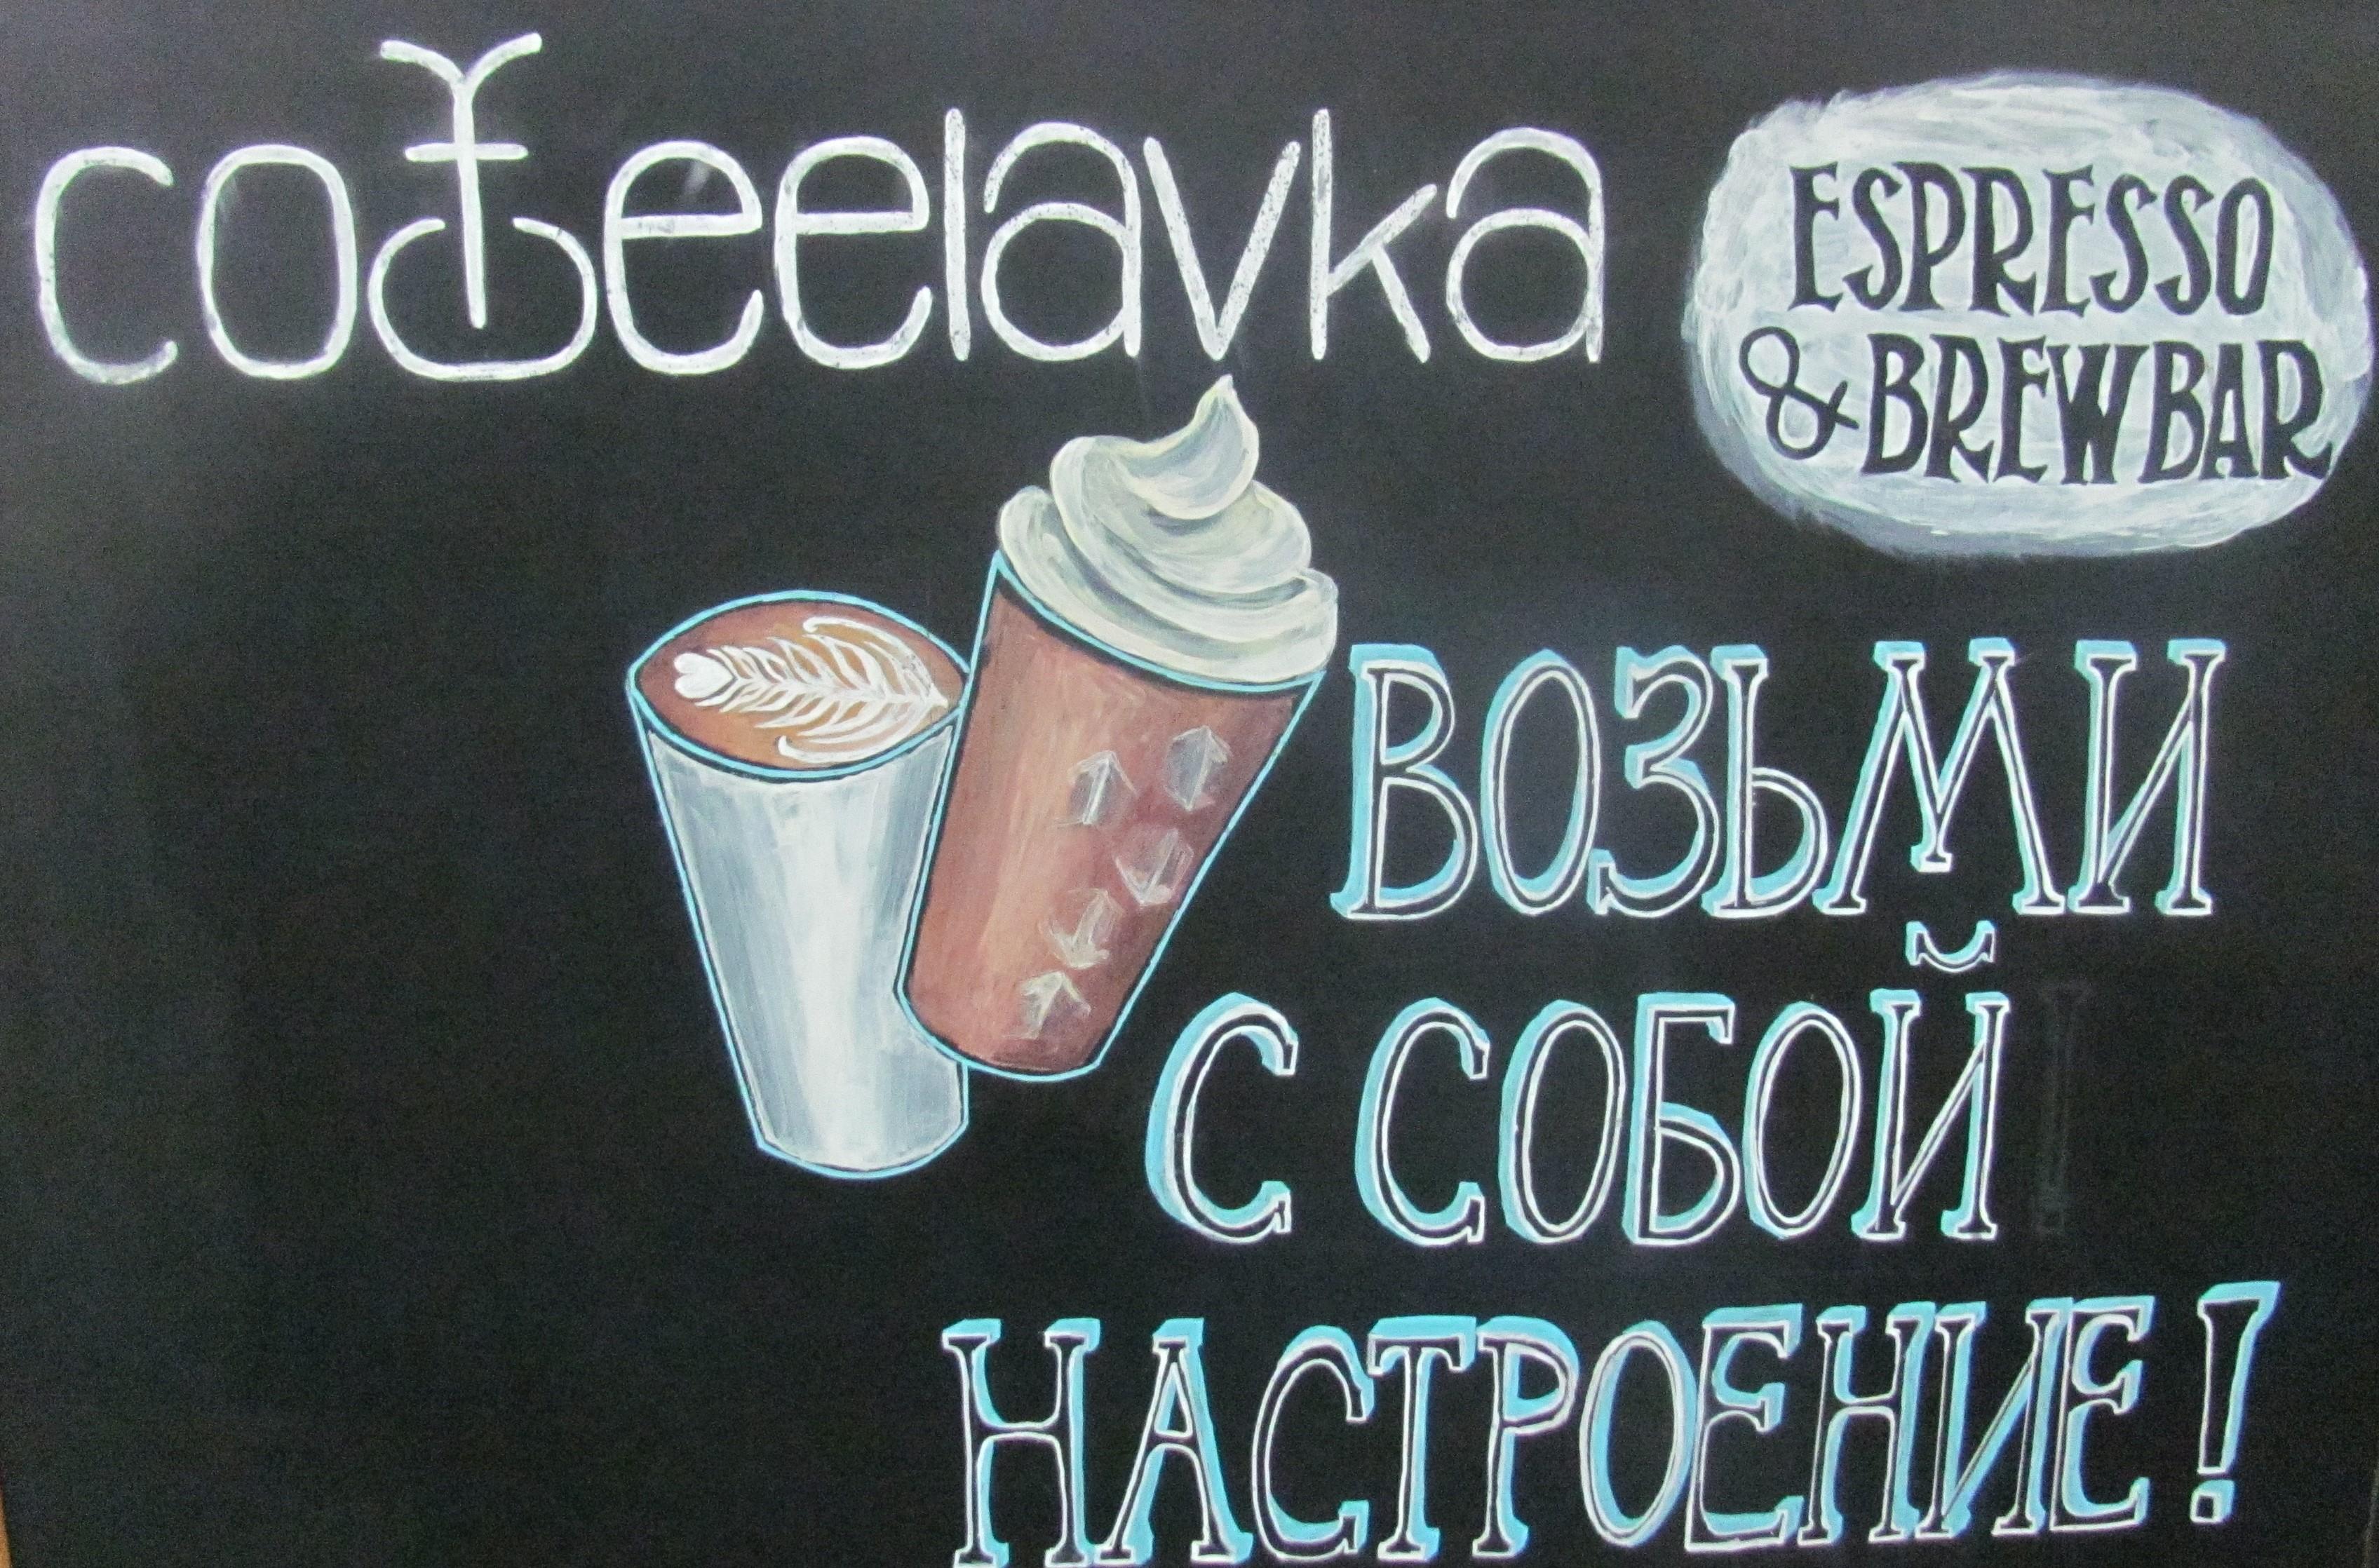 Photo of COFFEELAVKA. От любви к кофе до бизнеса мечты COFFEELAVKA. От любви к кофе до бизнеса мечты COFFEELAVKA. От любви к кофе до бизнеса мечты IMG 2600 2